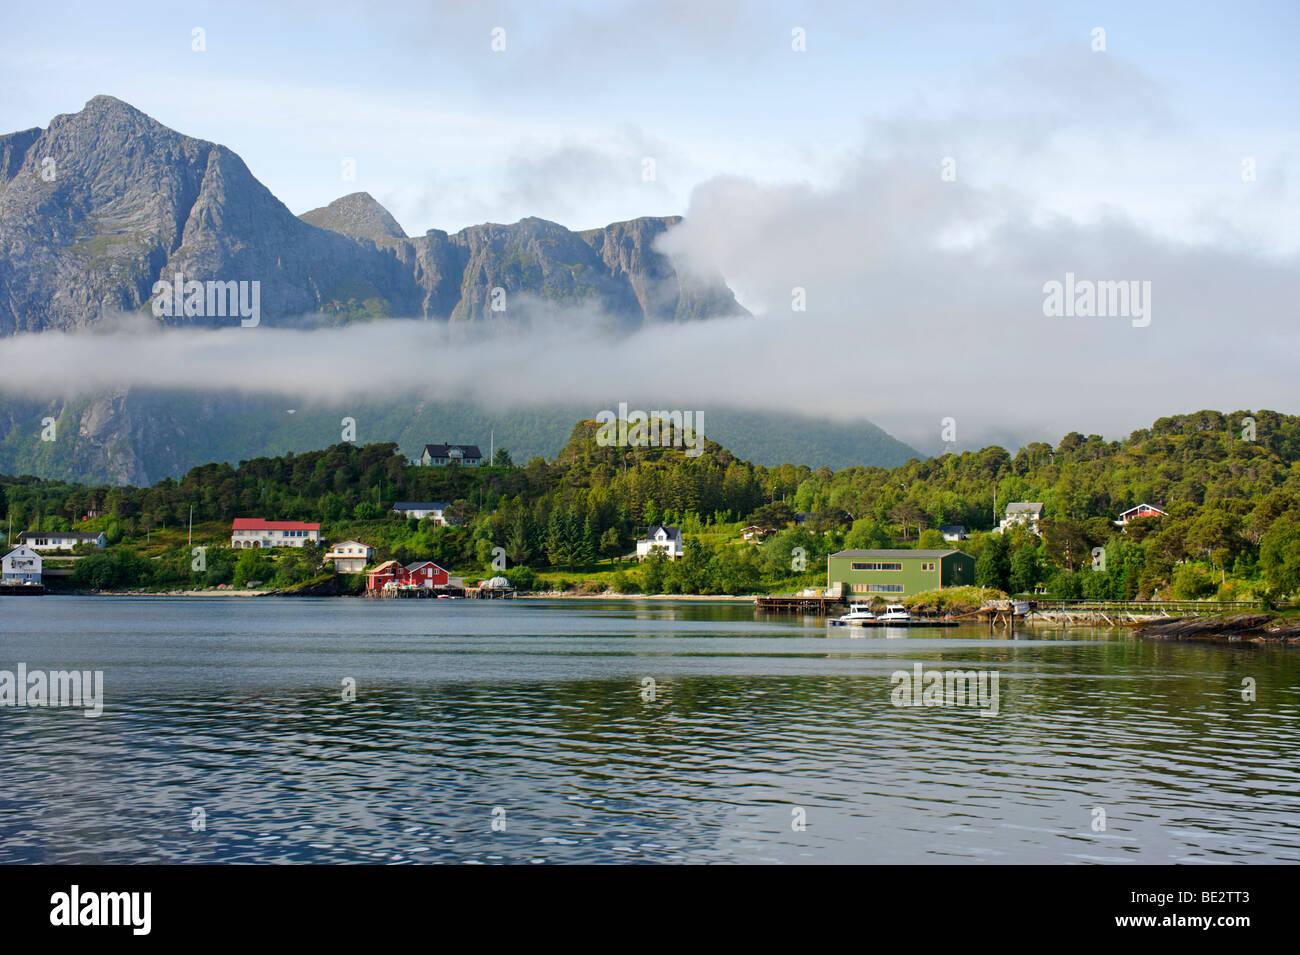 Holandfjord, Norway, Scandinavia, Europe - Stock Image